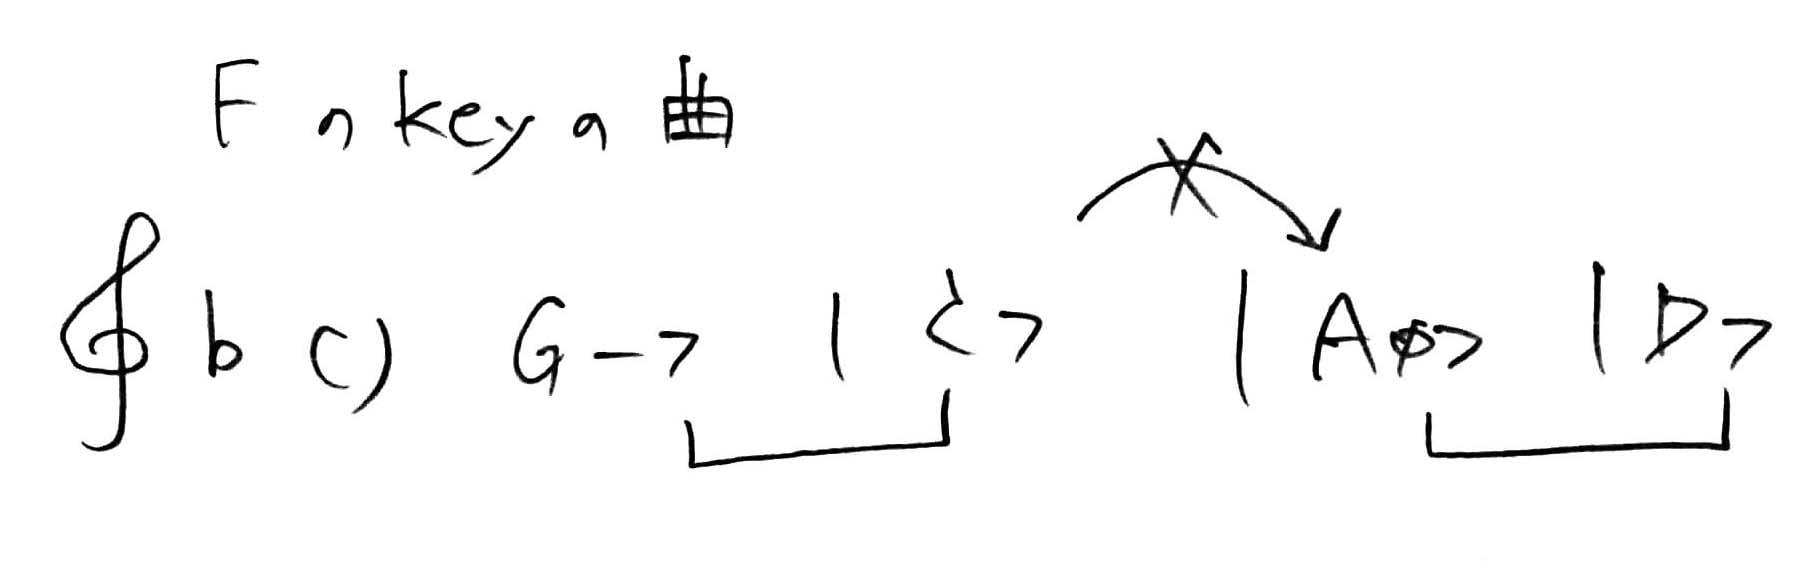 key-of-f